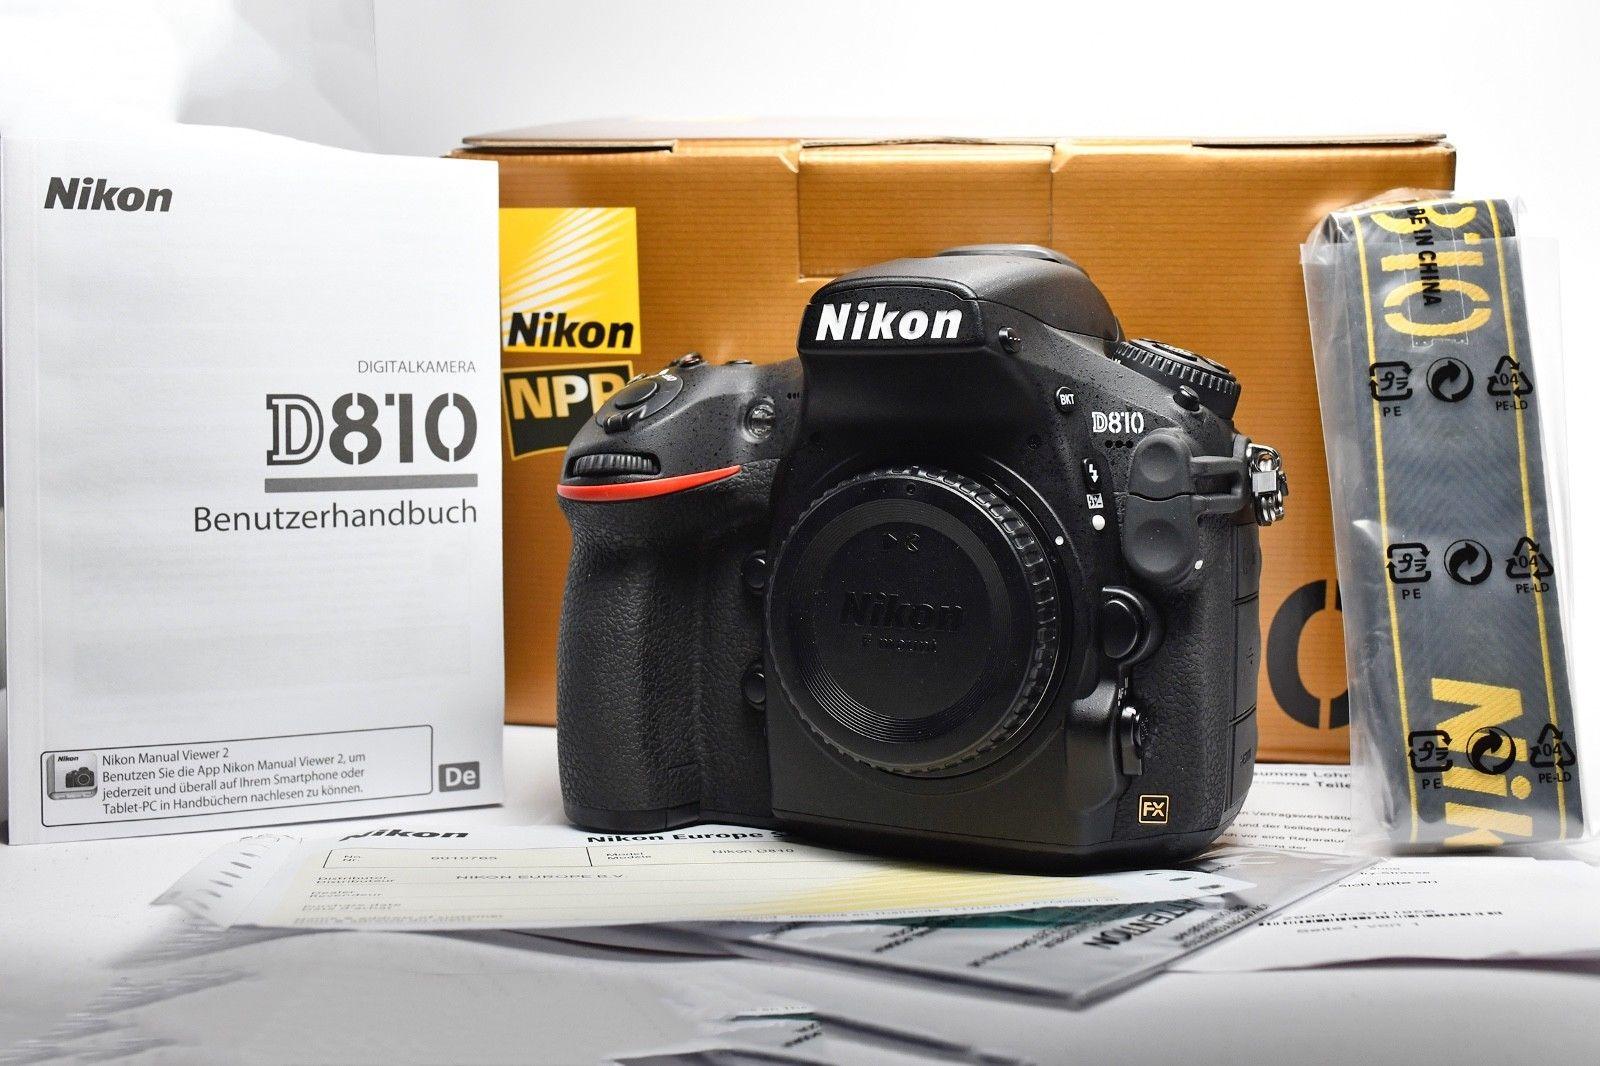 Nikon D810 body, 4411 Auslösungen, NPS clean + check, OVP, top, Nichtraucher